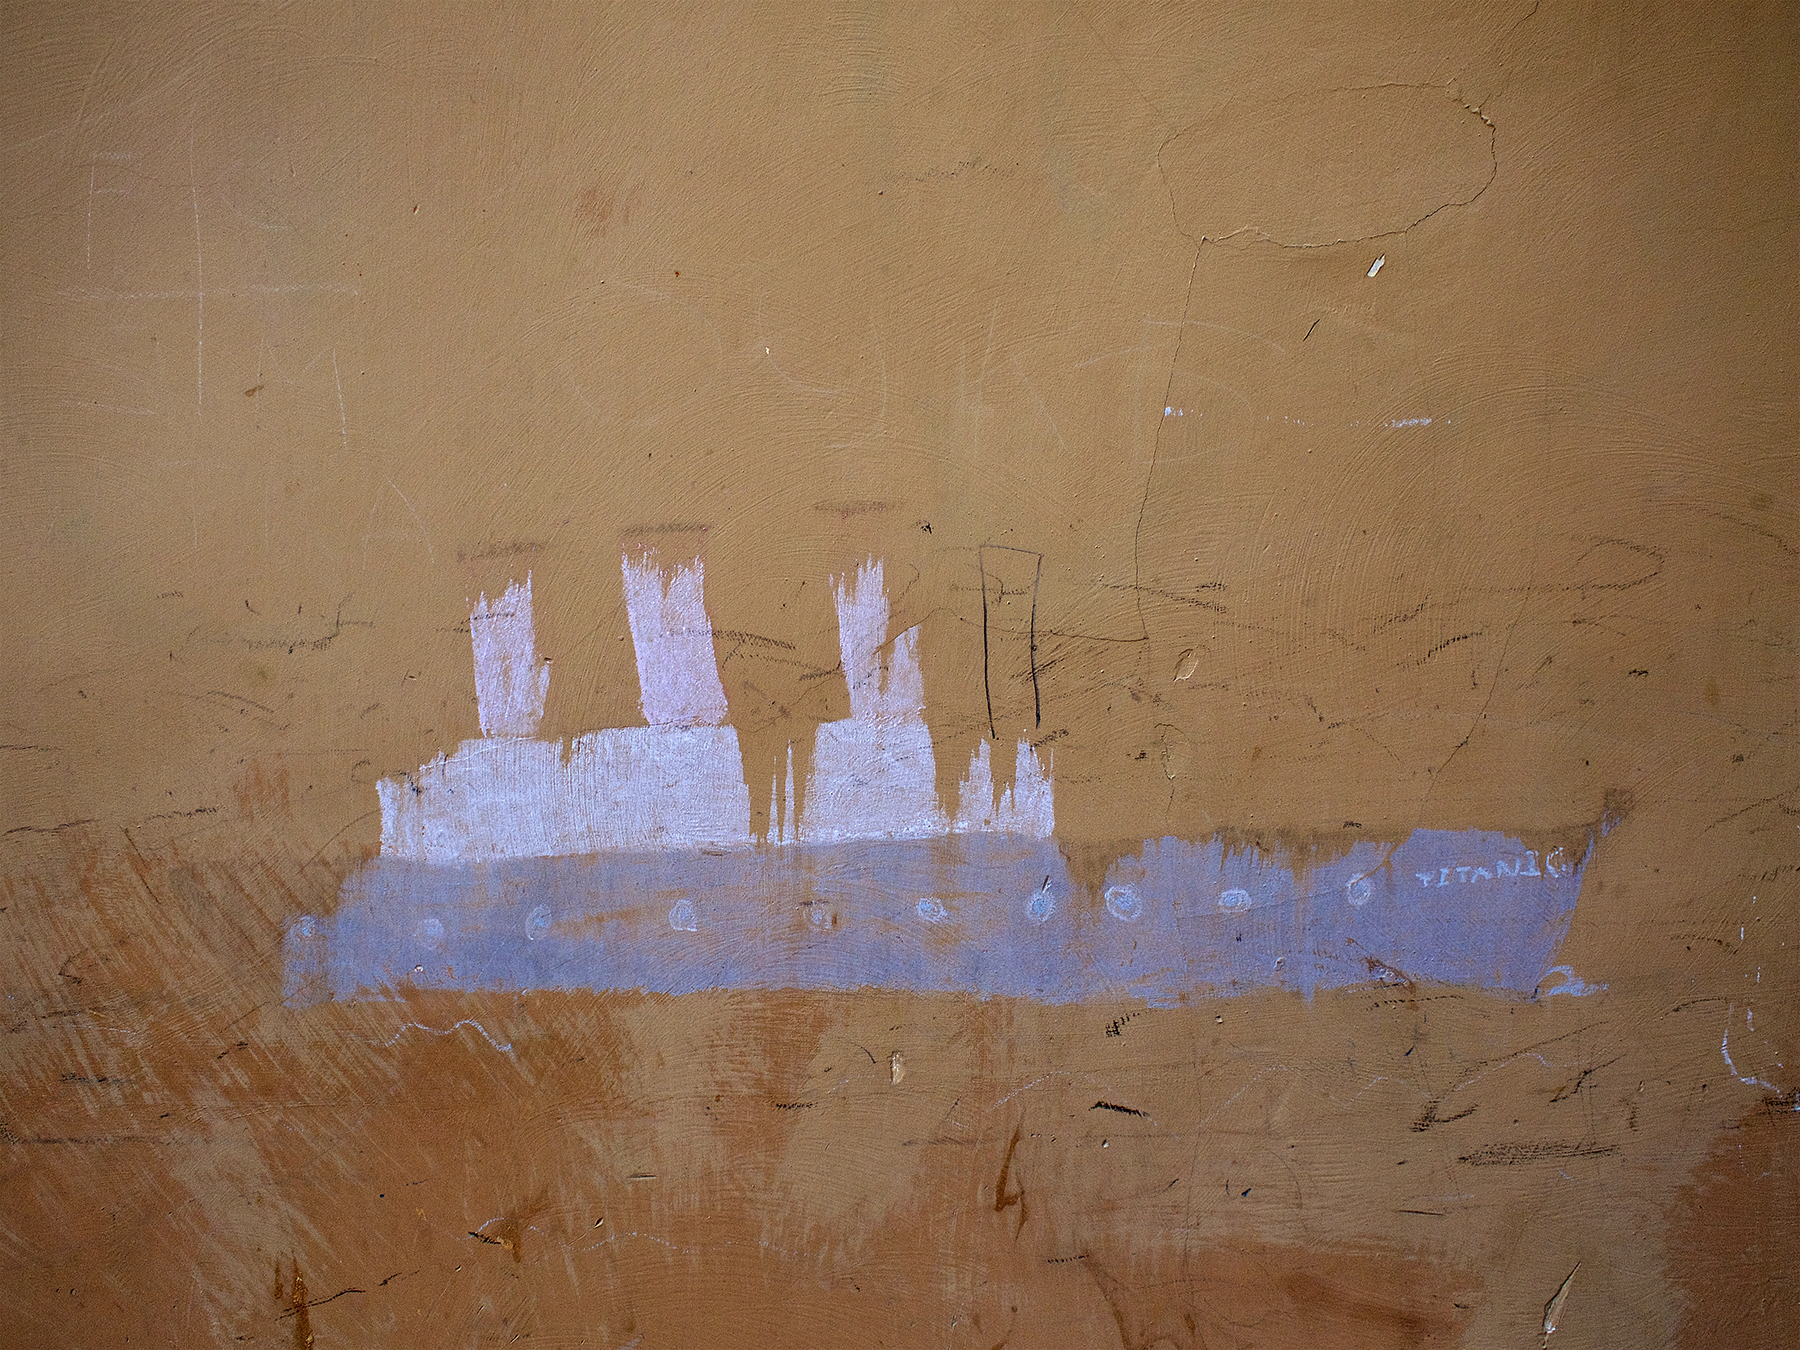 Titanic_R063538.jpg